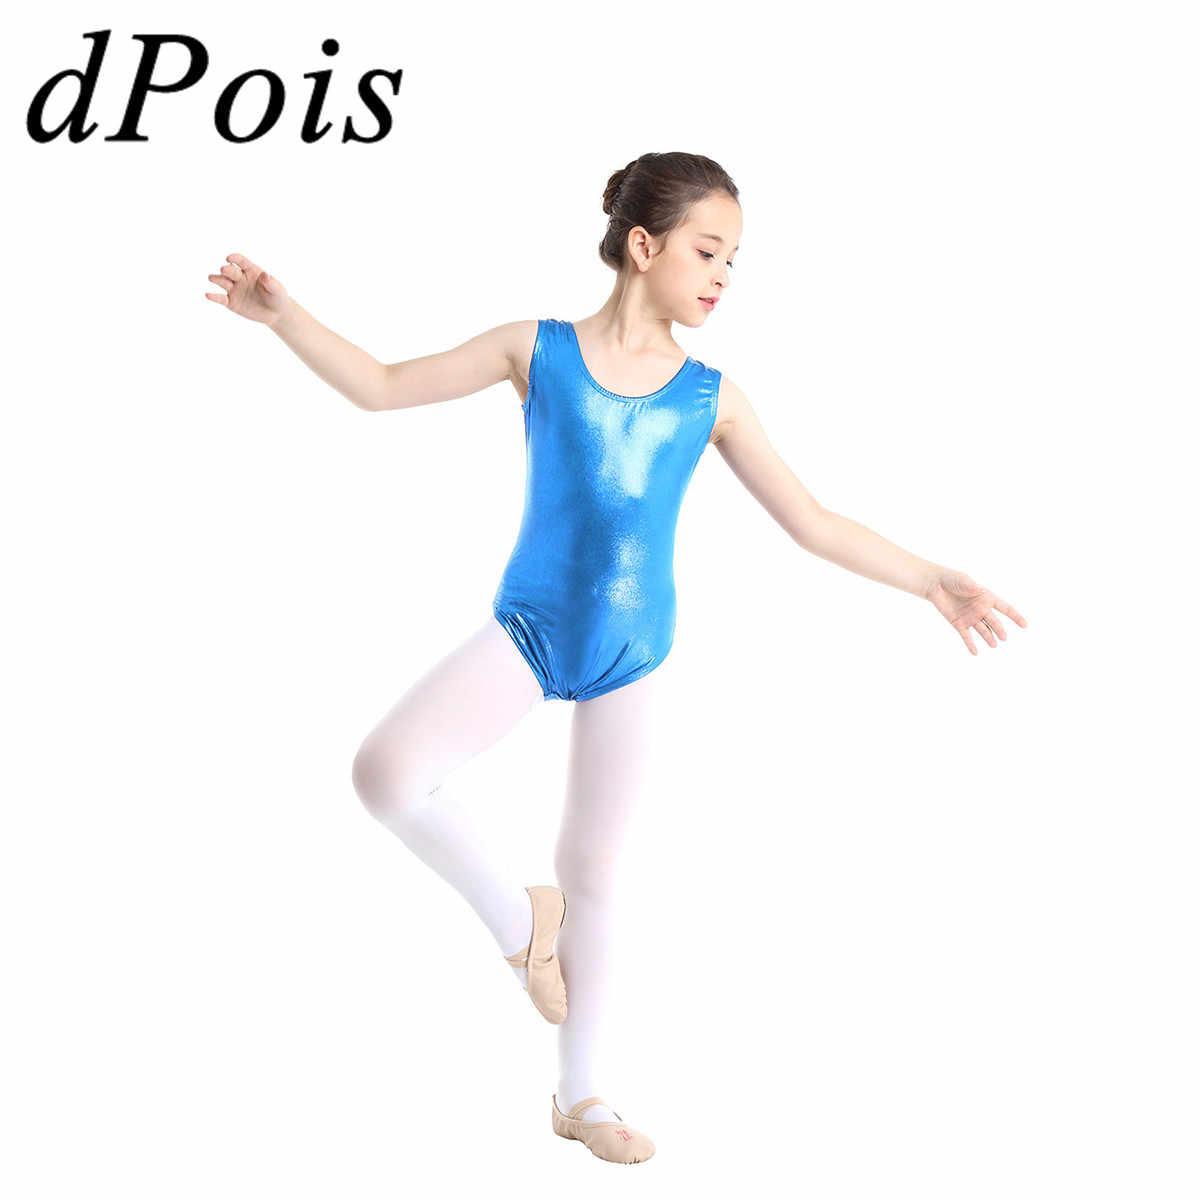 116b9b95f Toddler Kids Ballet Leotards for Girls Acrobatics Gymnastics Leotard  Sleeveless Shiny Metallic Dance Wear Ballerina Bodysuit